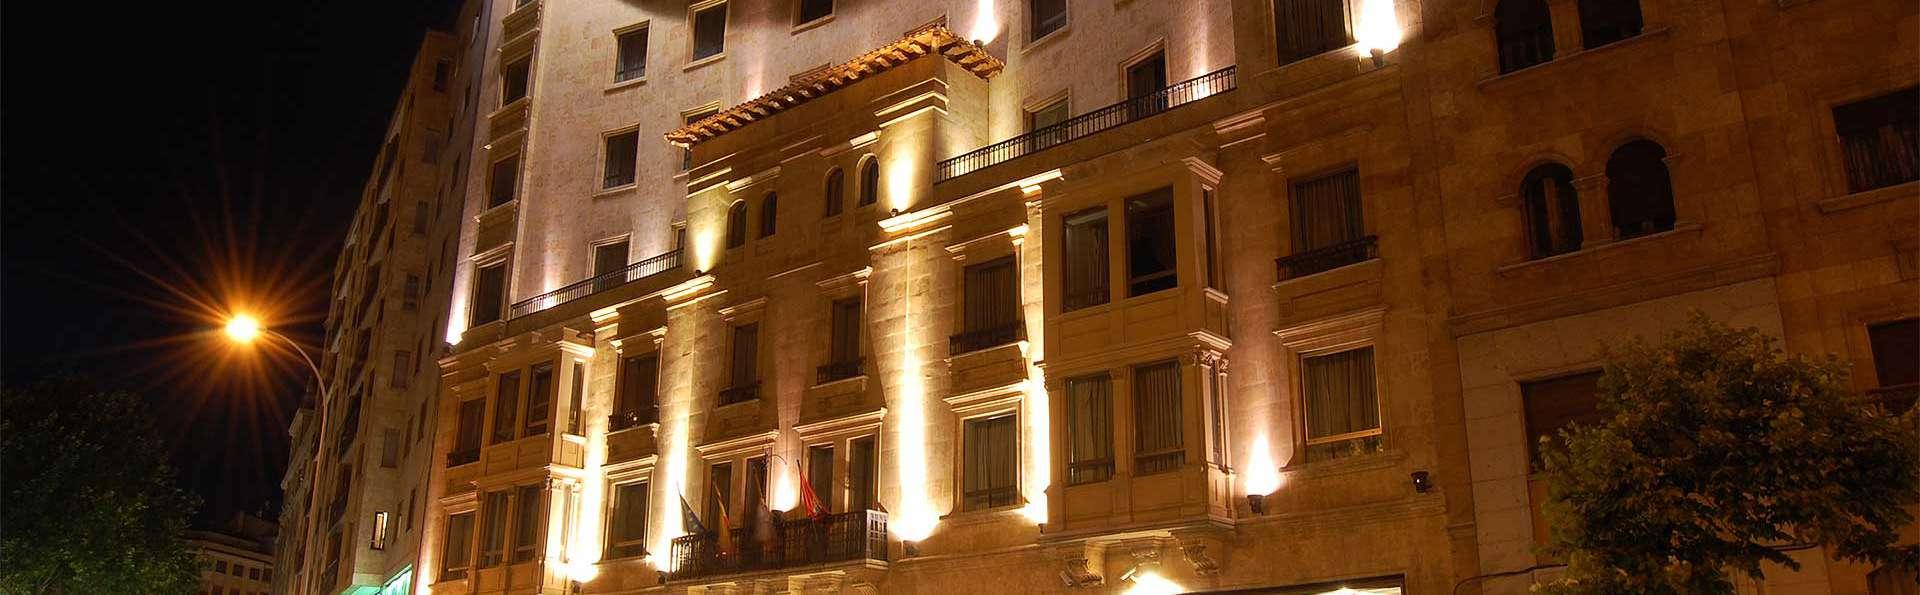 Hotel Alameda Palace - EDIT_Exterior1.jpg